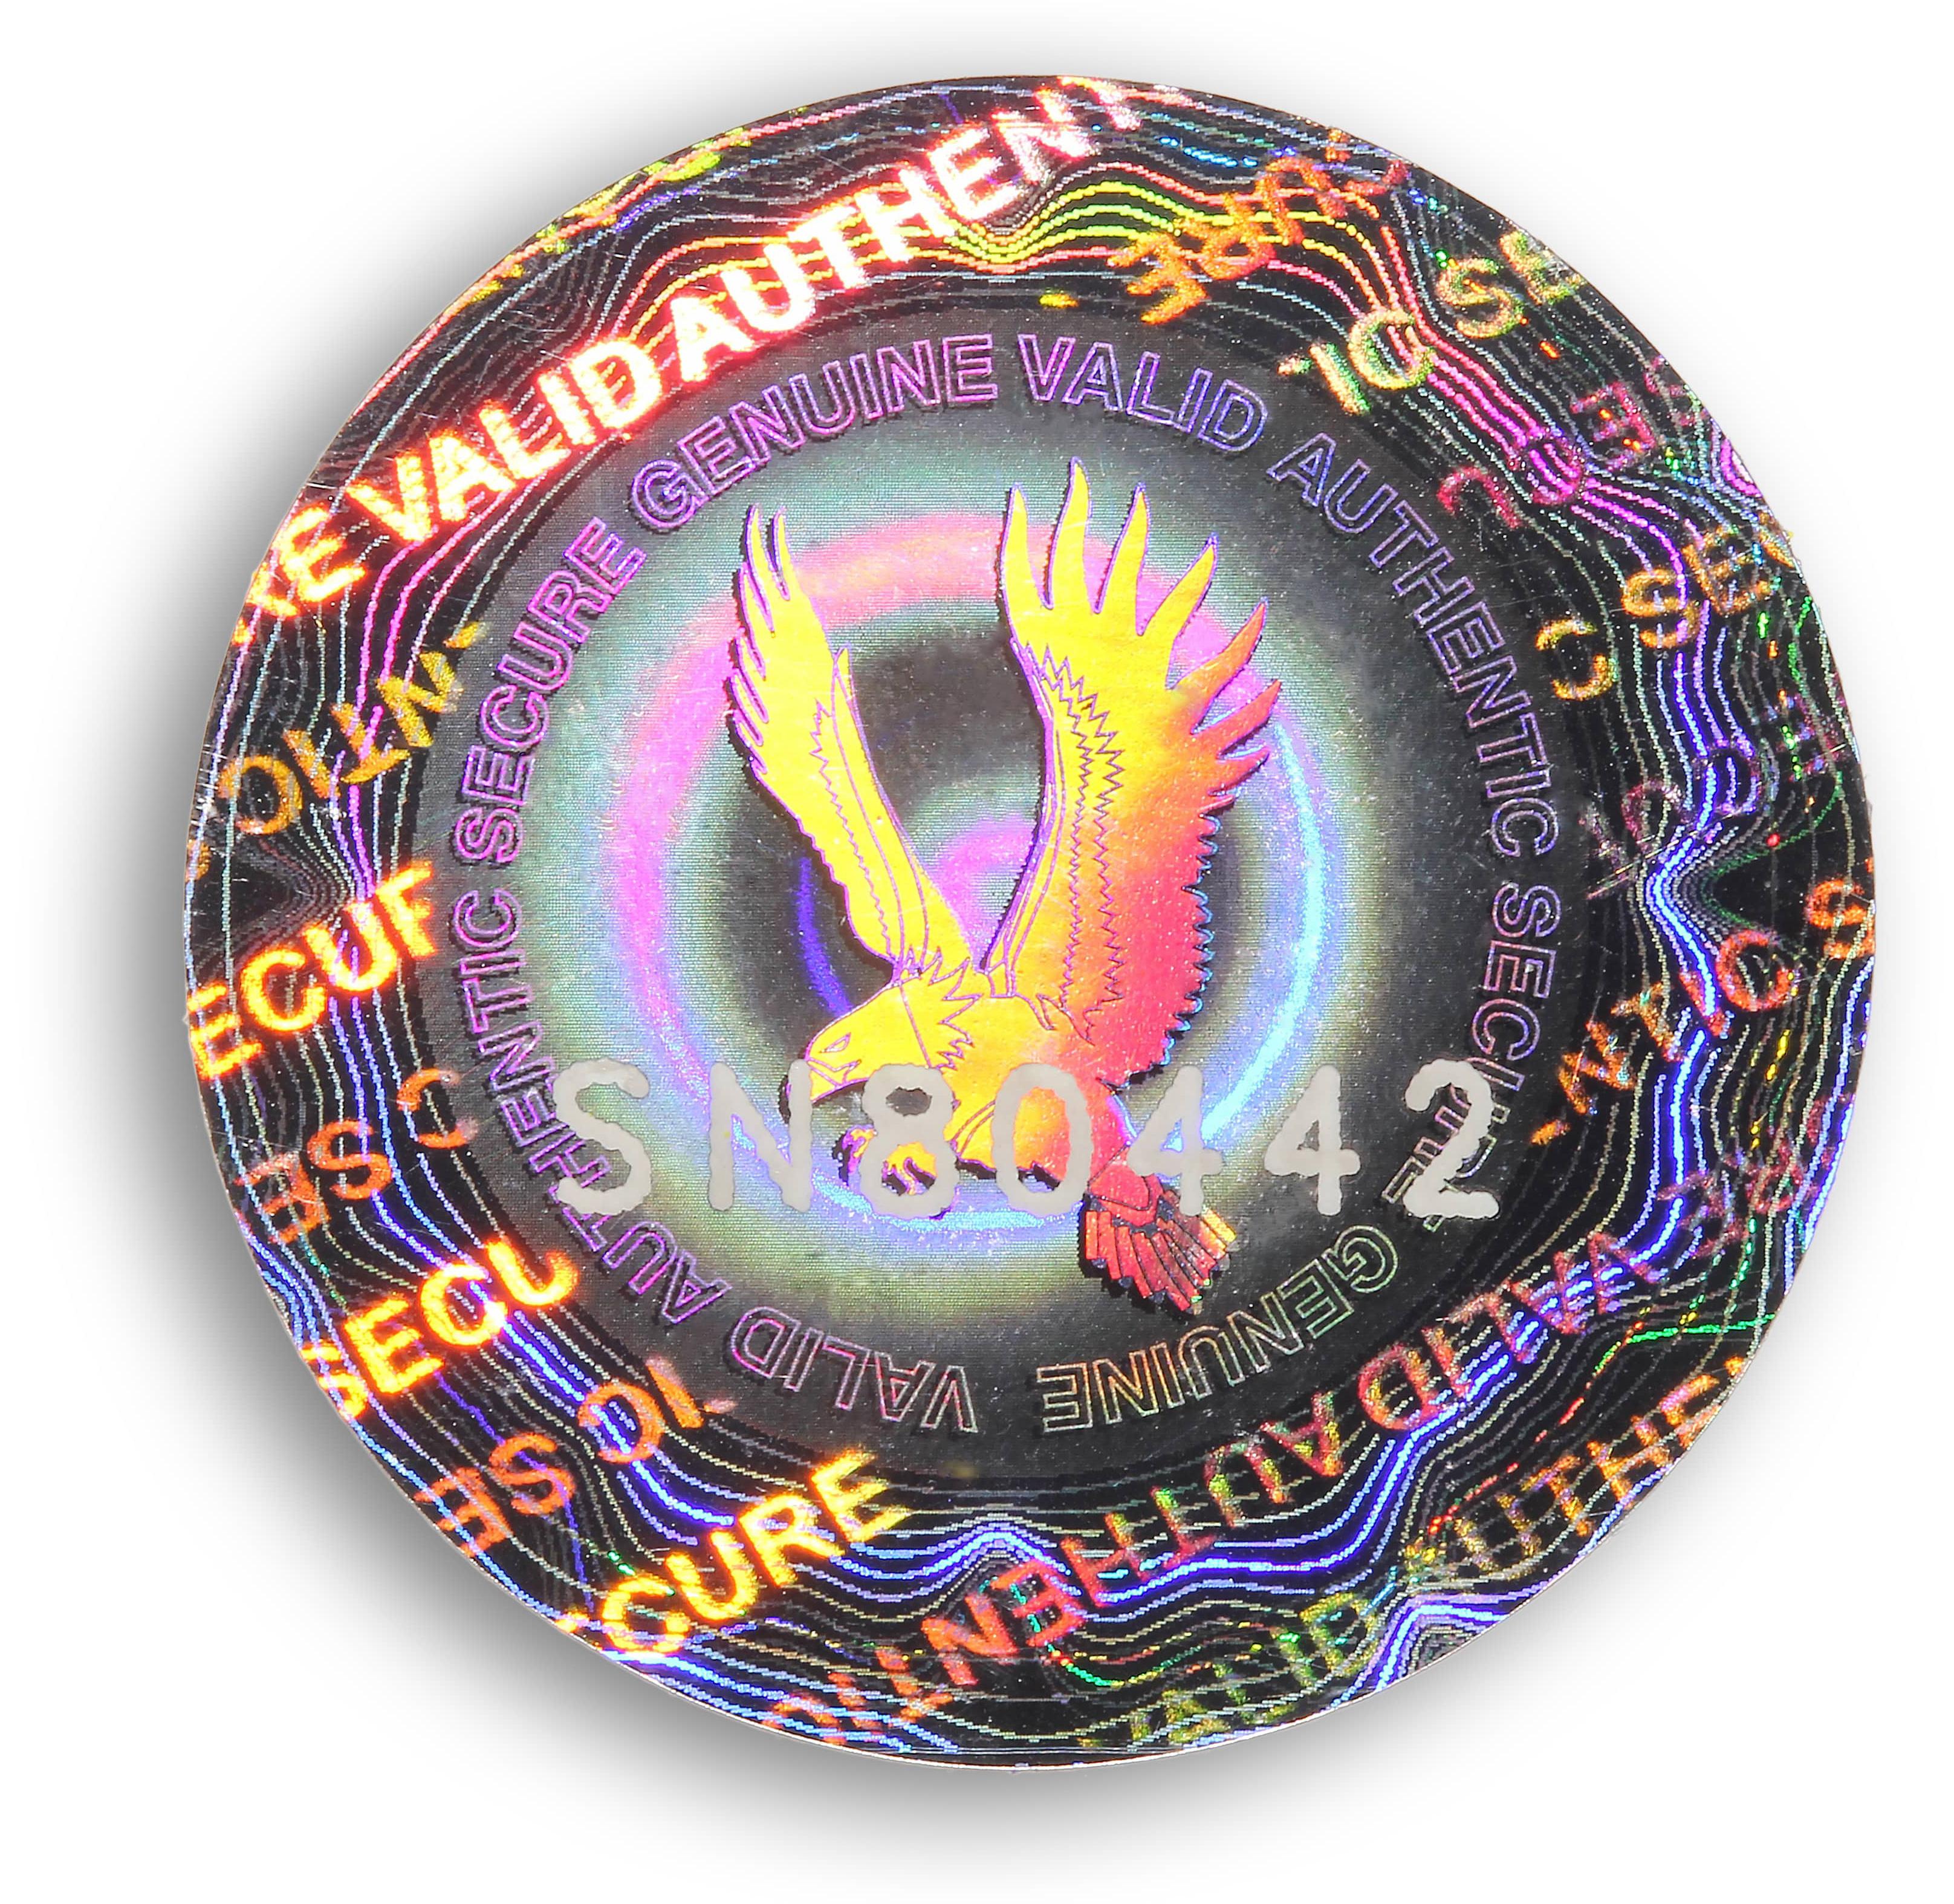 hologramme-eagle-valid